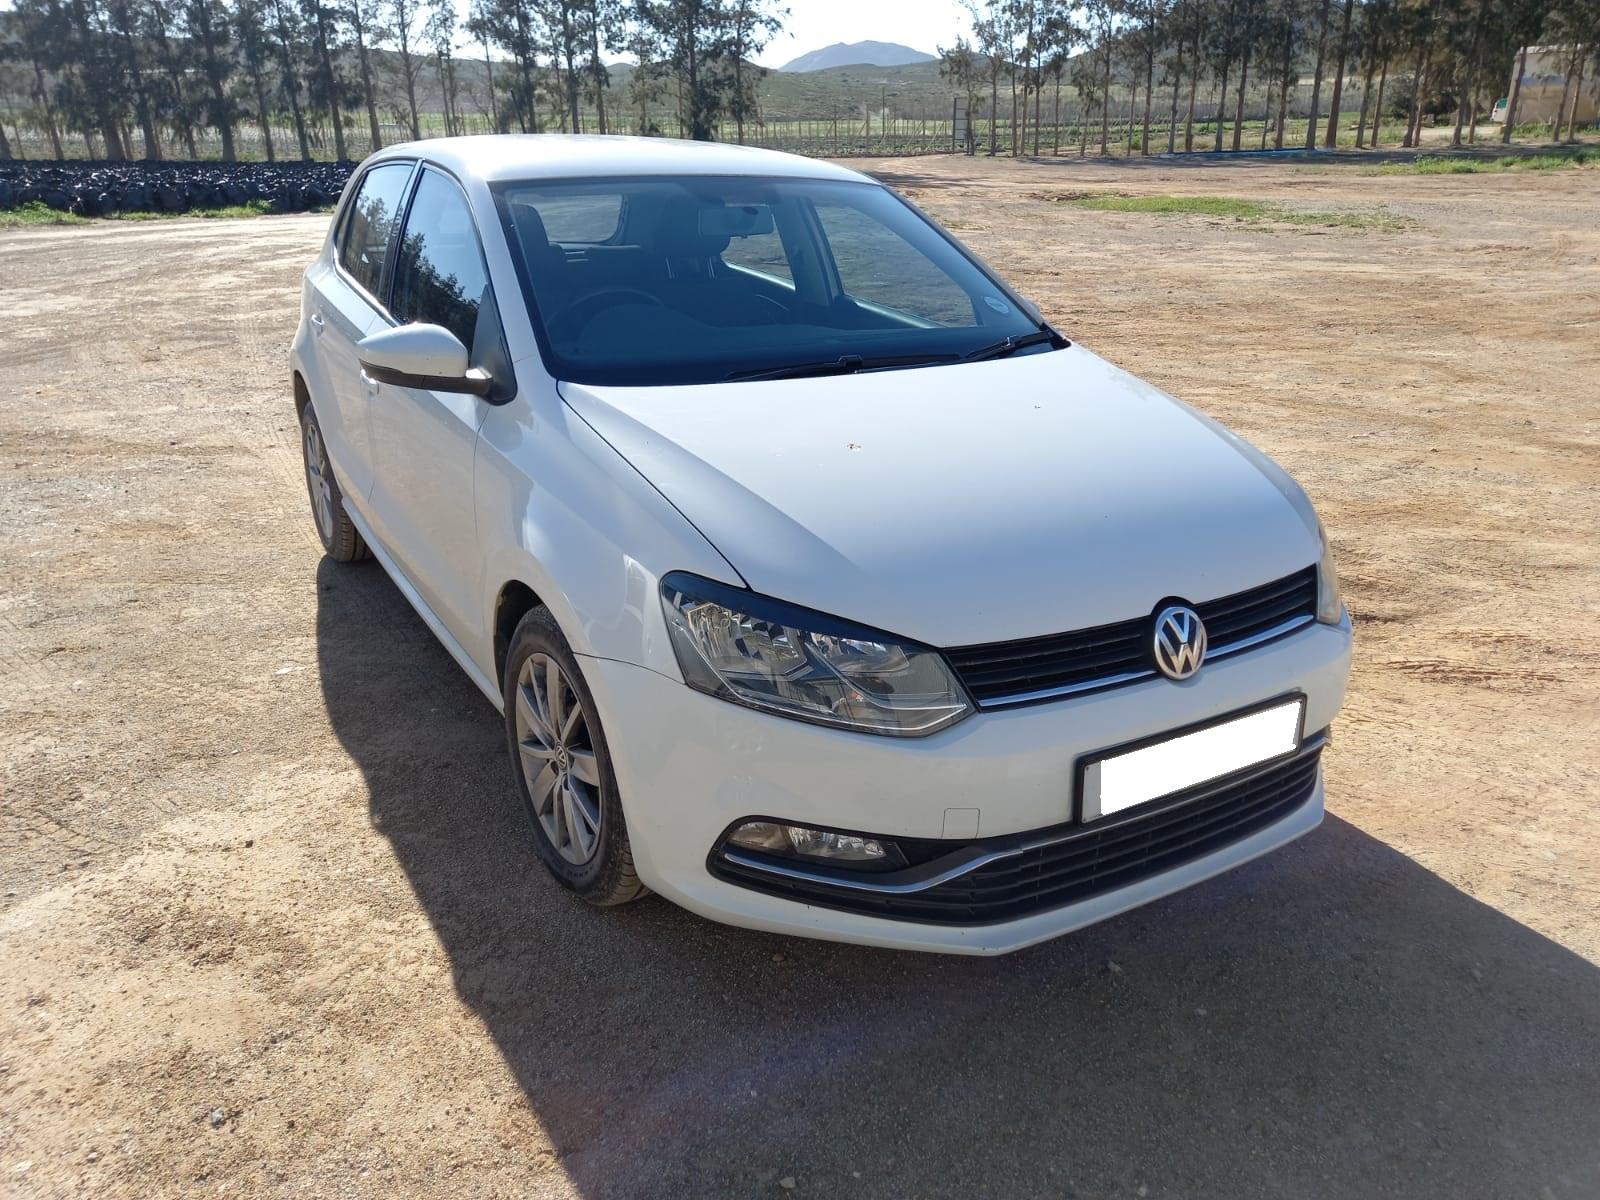 2014 Volkswagen Polo Gp 1.2 TSi